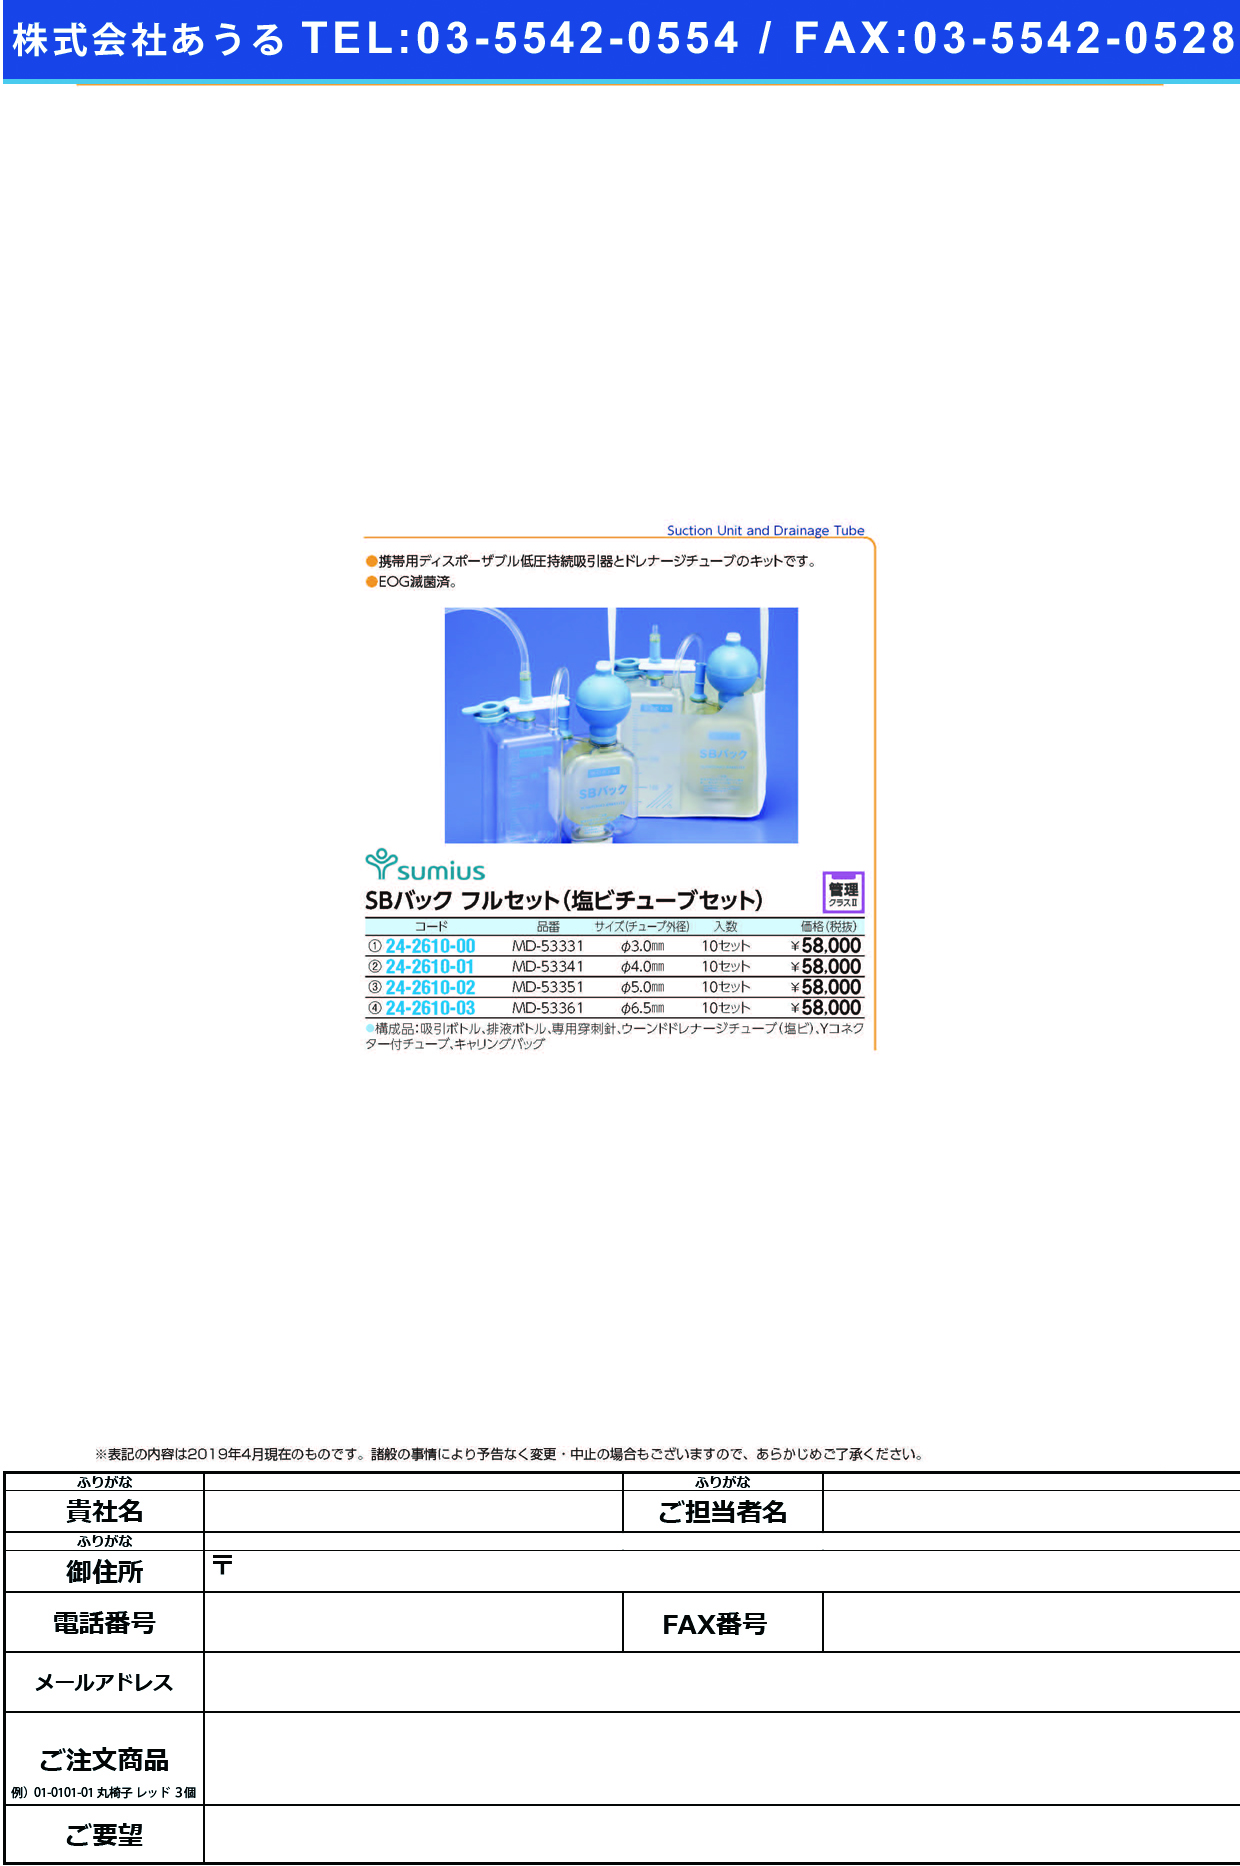 (24-2610-00)SBバック塩ビチューブセット MD-53331(3.0MM)10イリ SBバック(住友ベークライト)【1箱単位】【2019年カタログ商品】